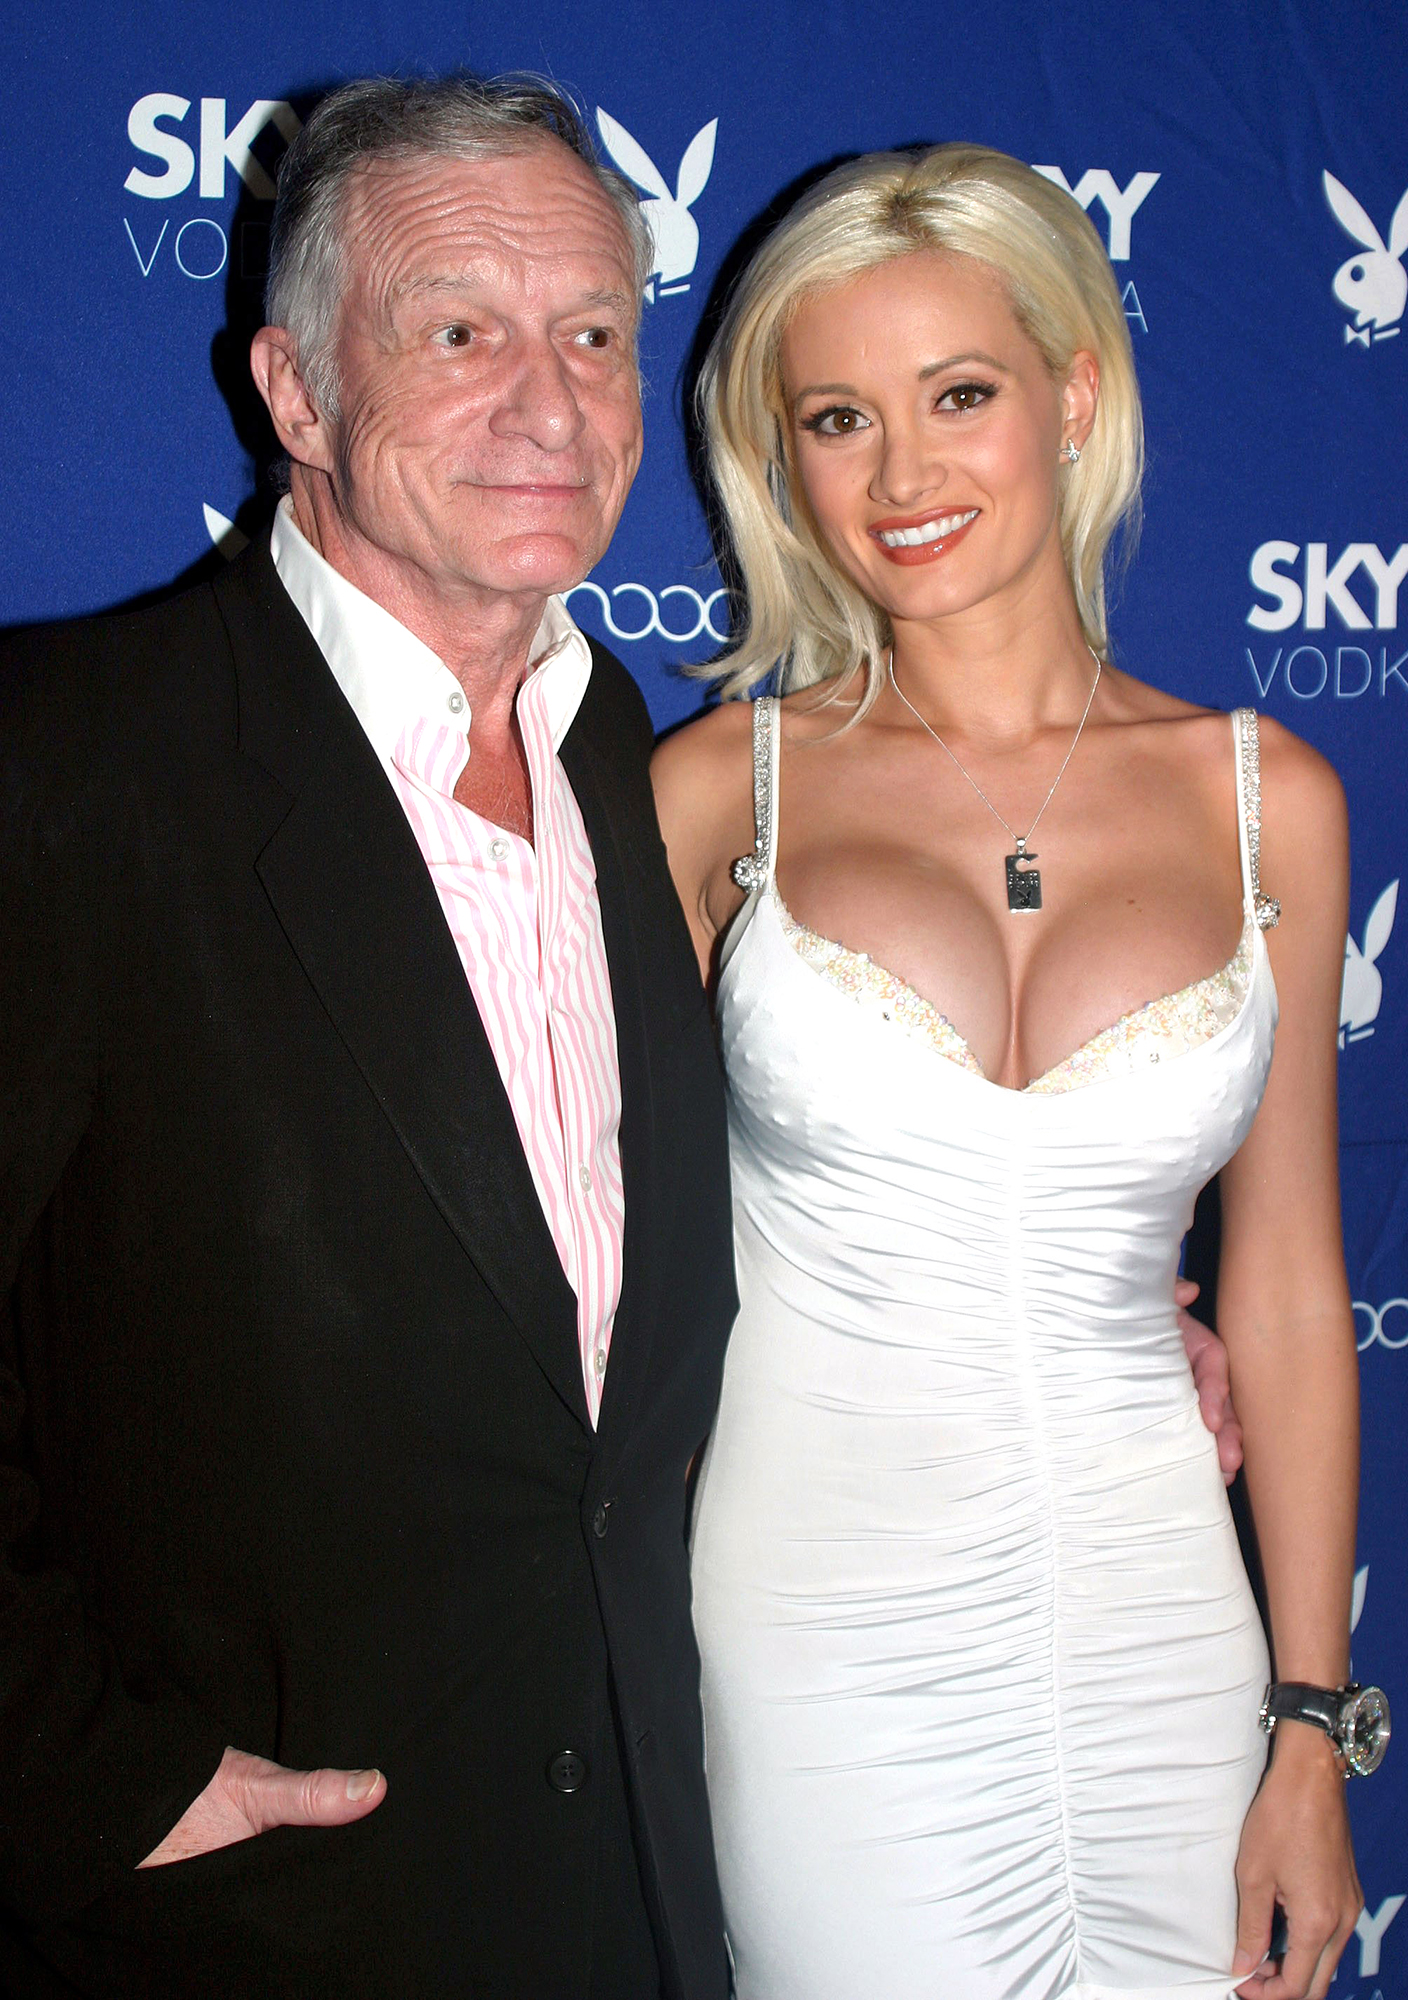 Holly Madison Looks Back On Sex Life With Hugh Hefner